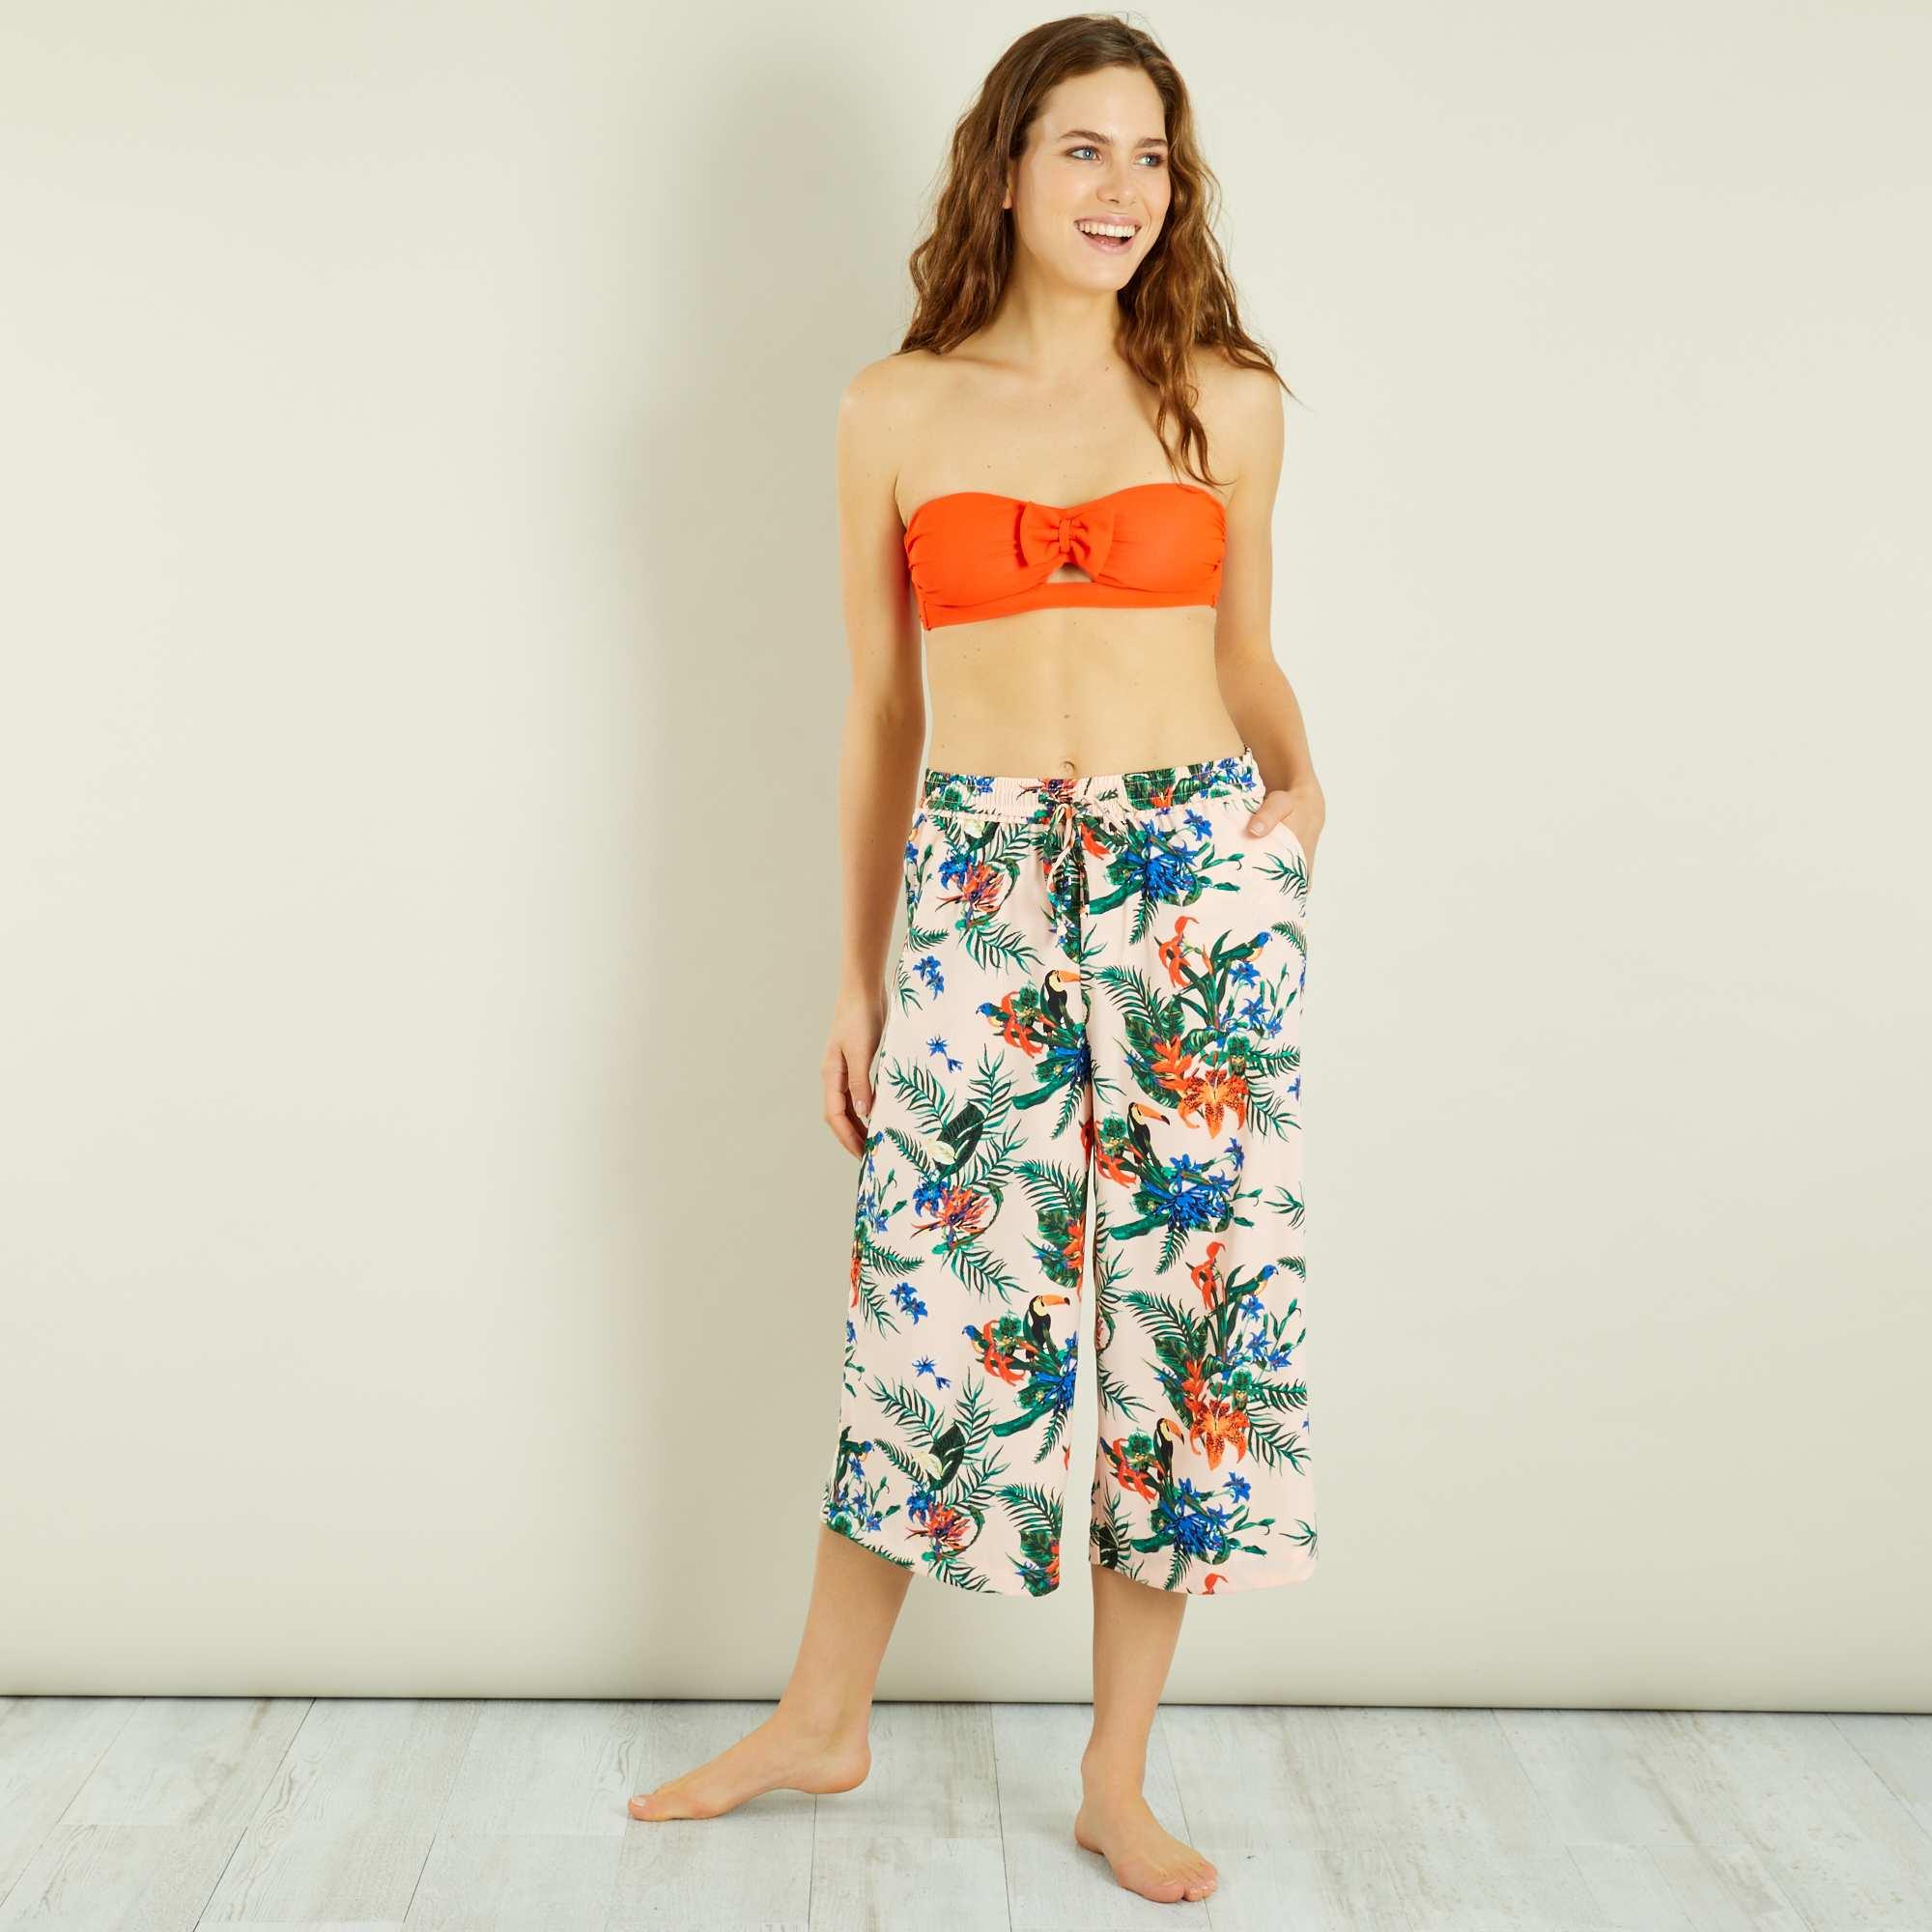 jupe culotte fluide fleurie femme kiabi 18 00. Black Bedroom Furniture Sets. Home Design Ideas